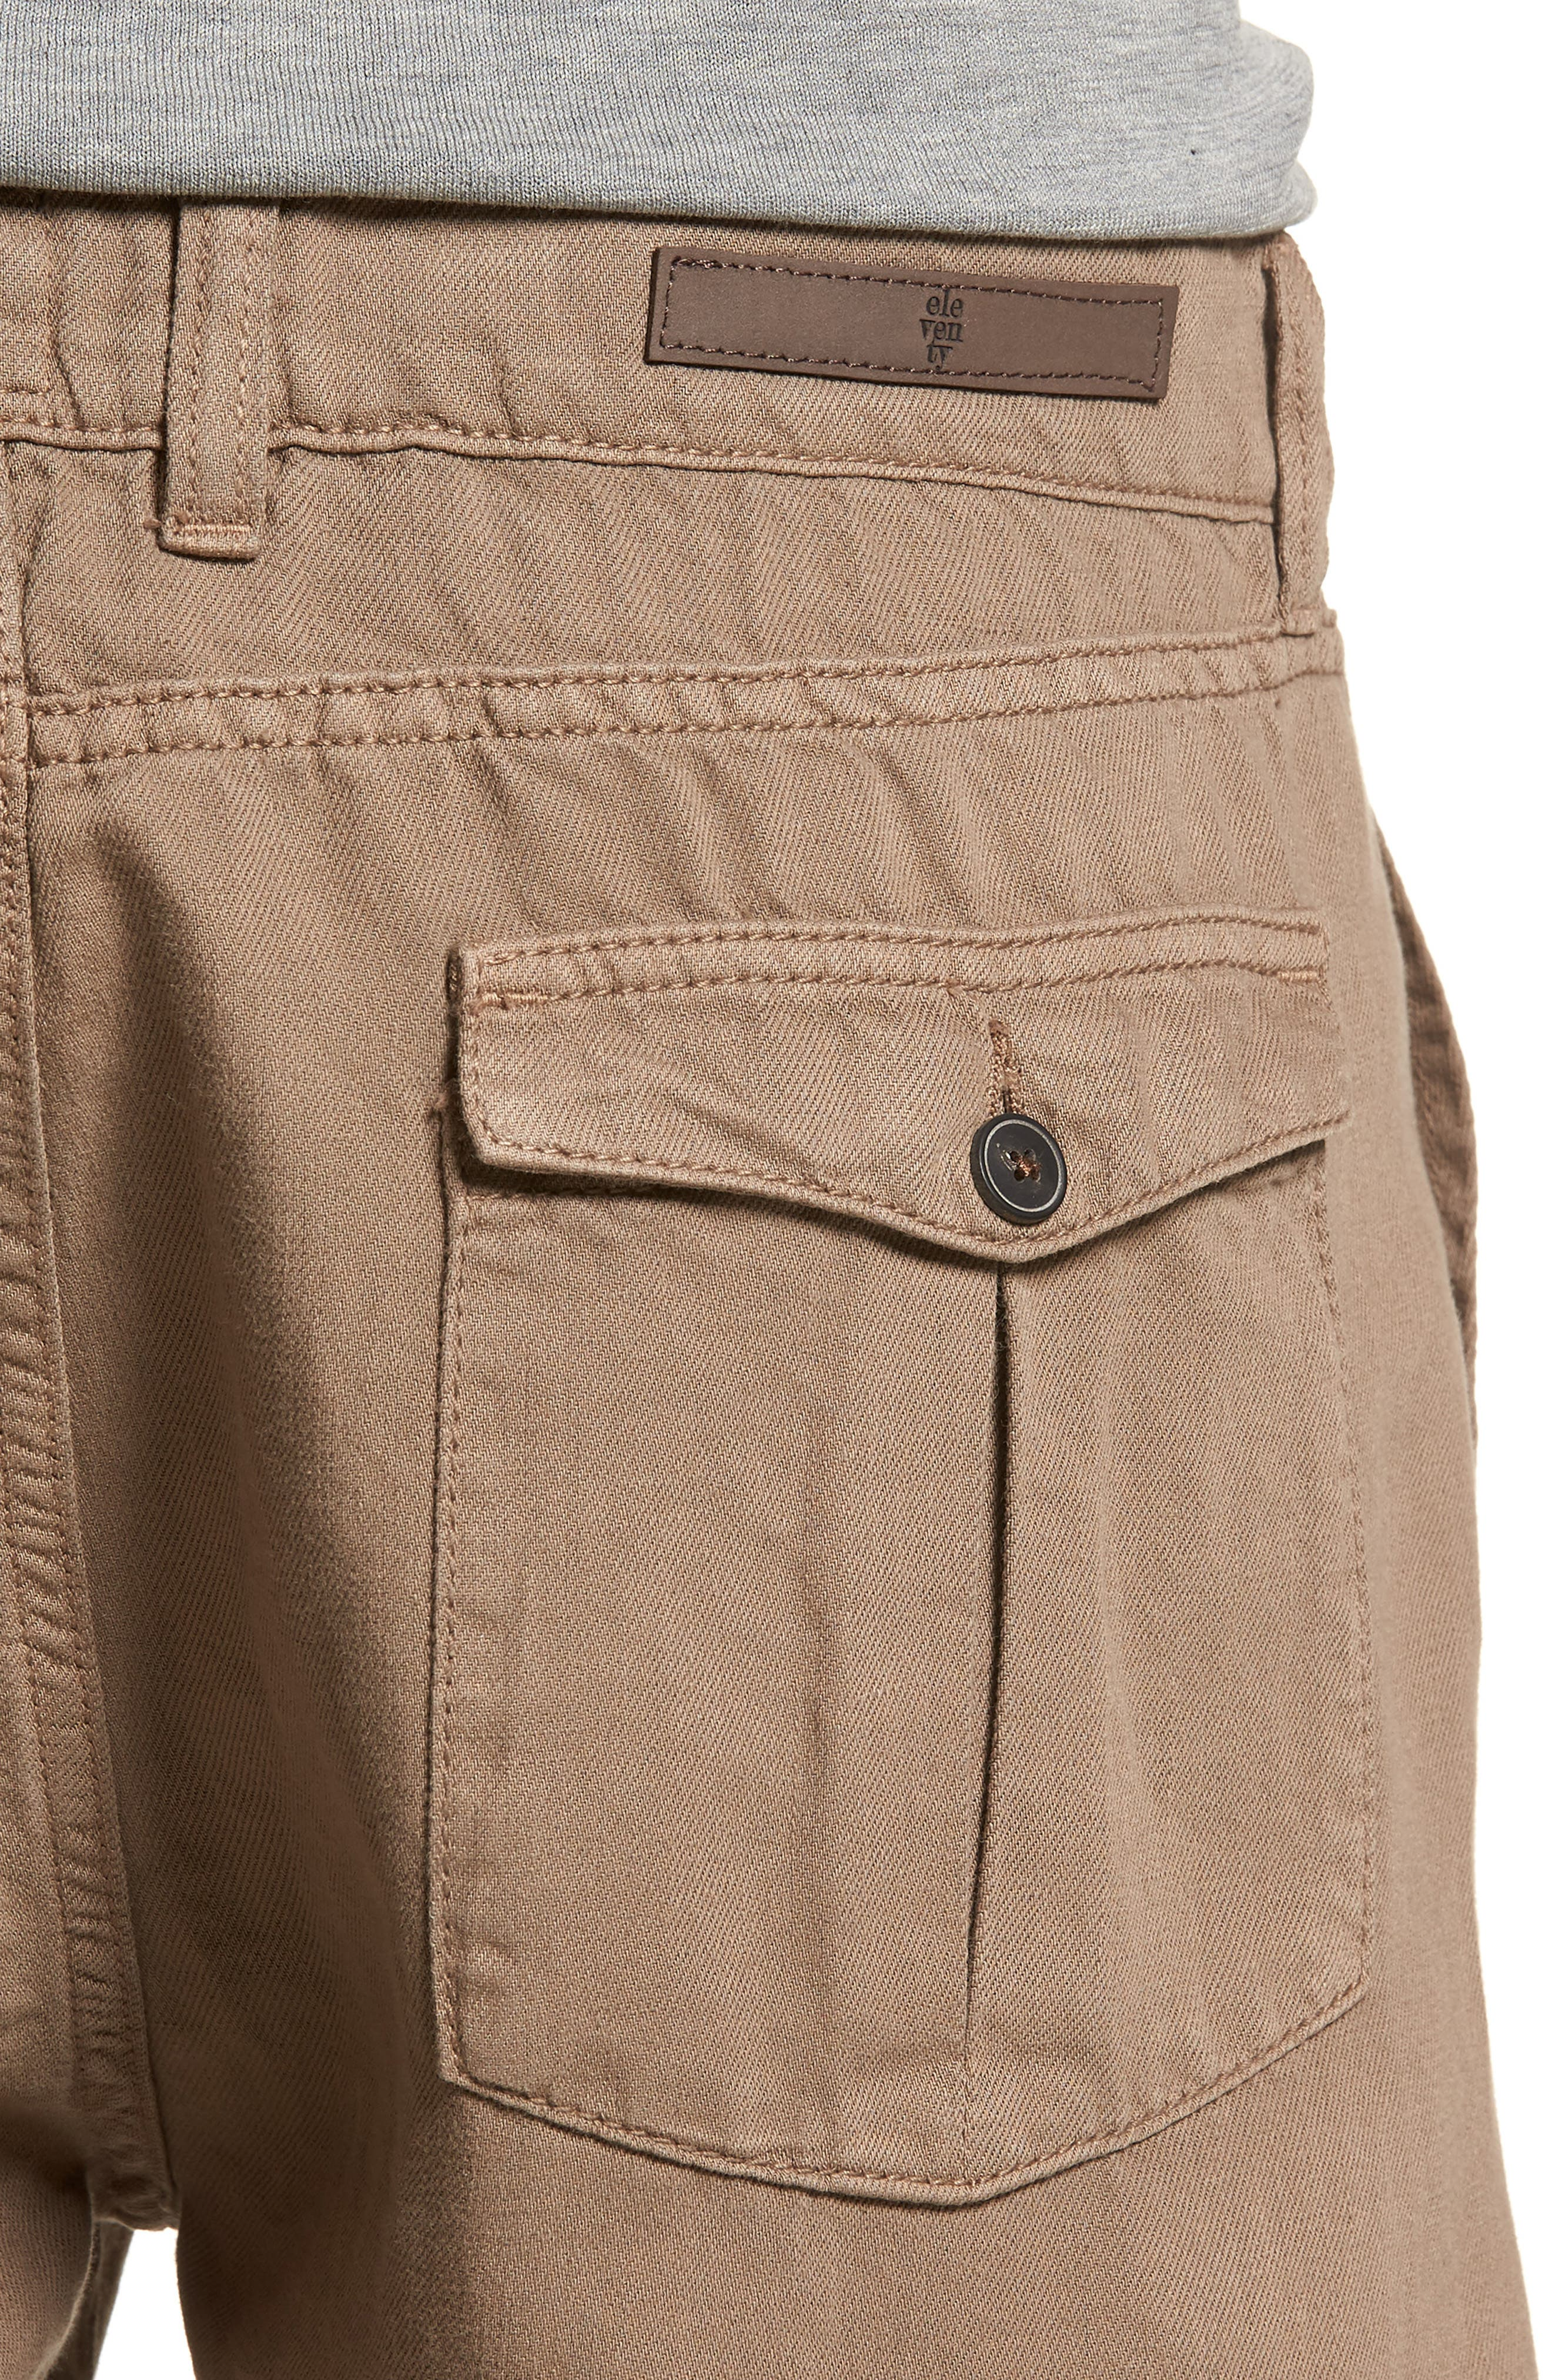 Fatique Bermuda Shorts,                             Alternate thumbnail 4, color,                             Taupe